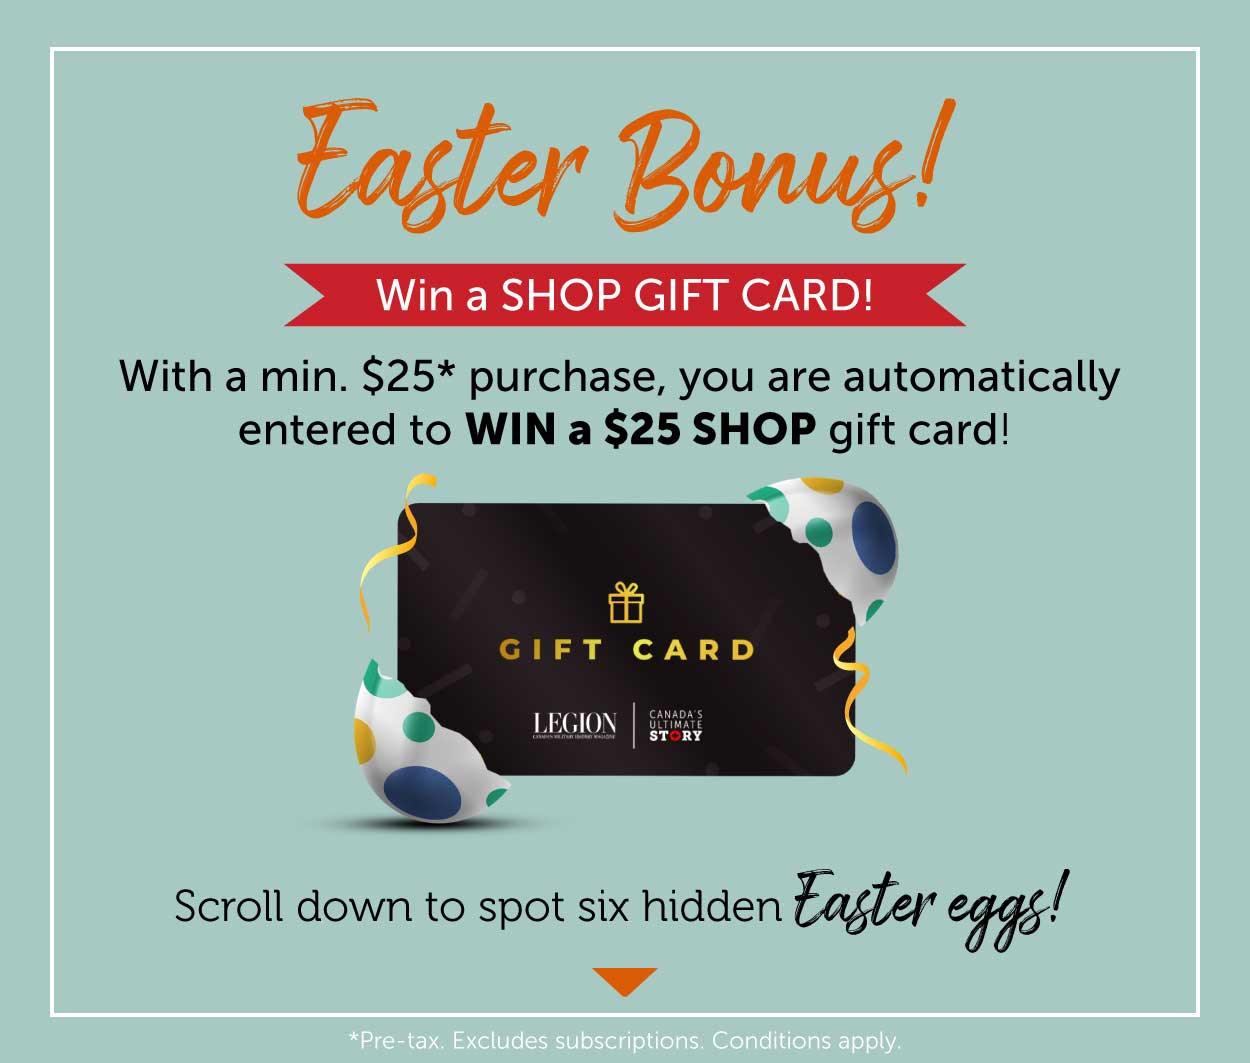 Pre-Easter BONUS! Win a GIFT CARD!